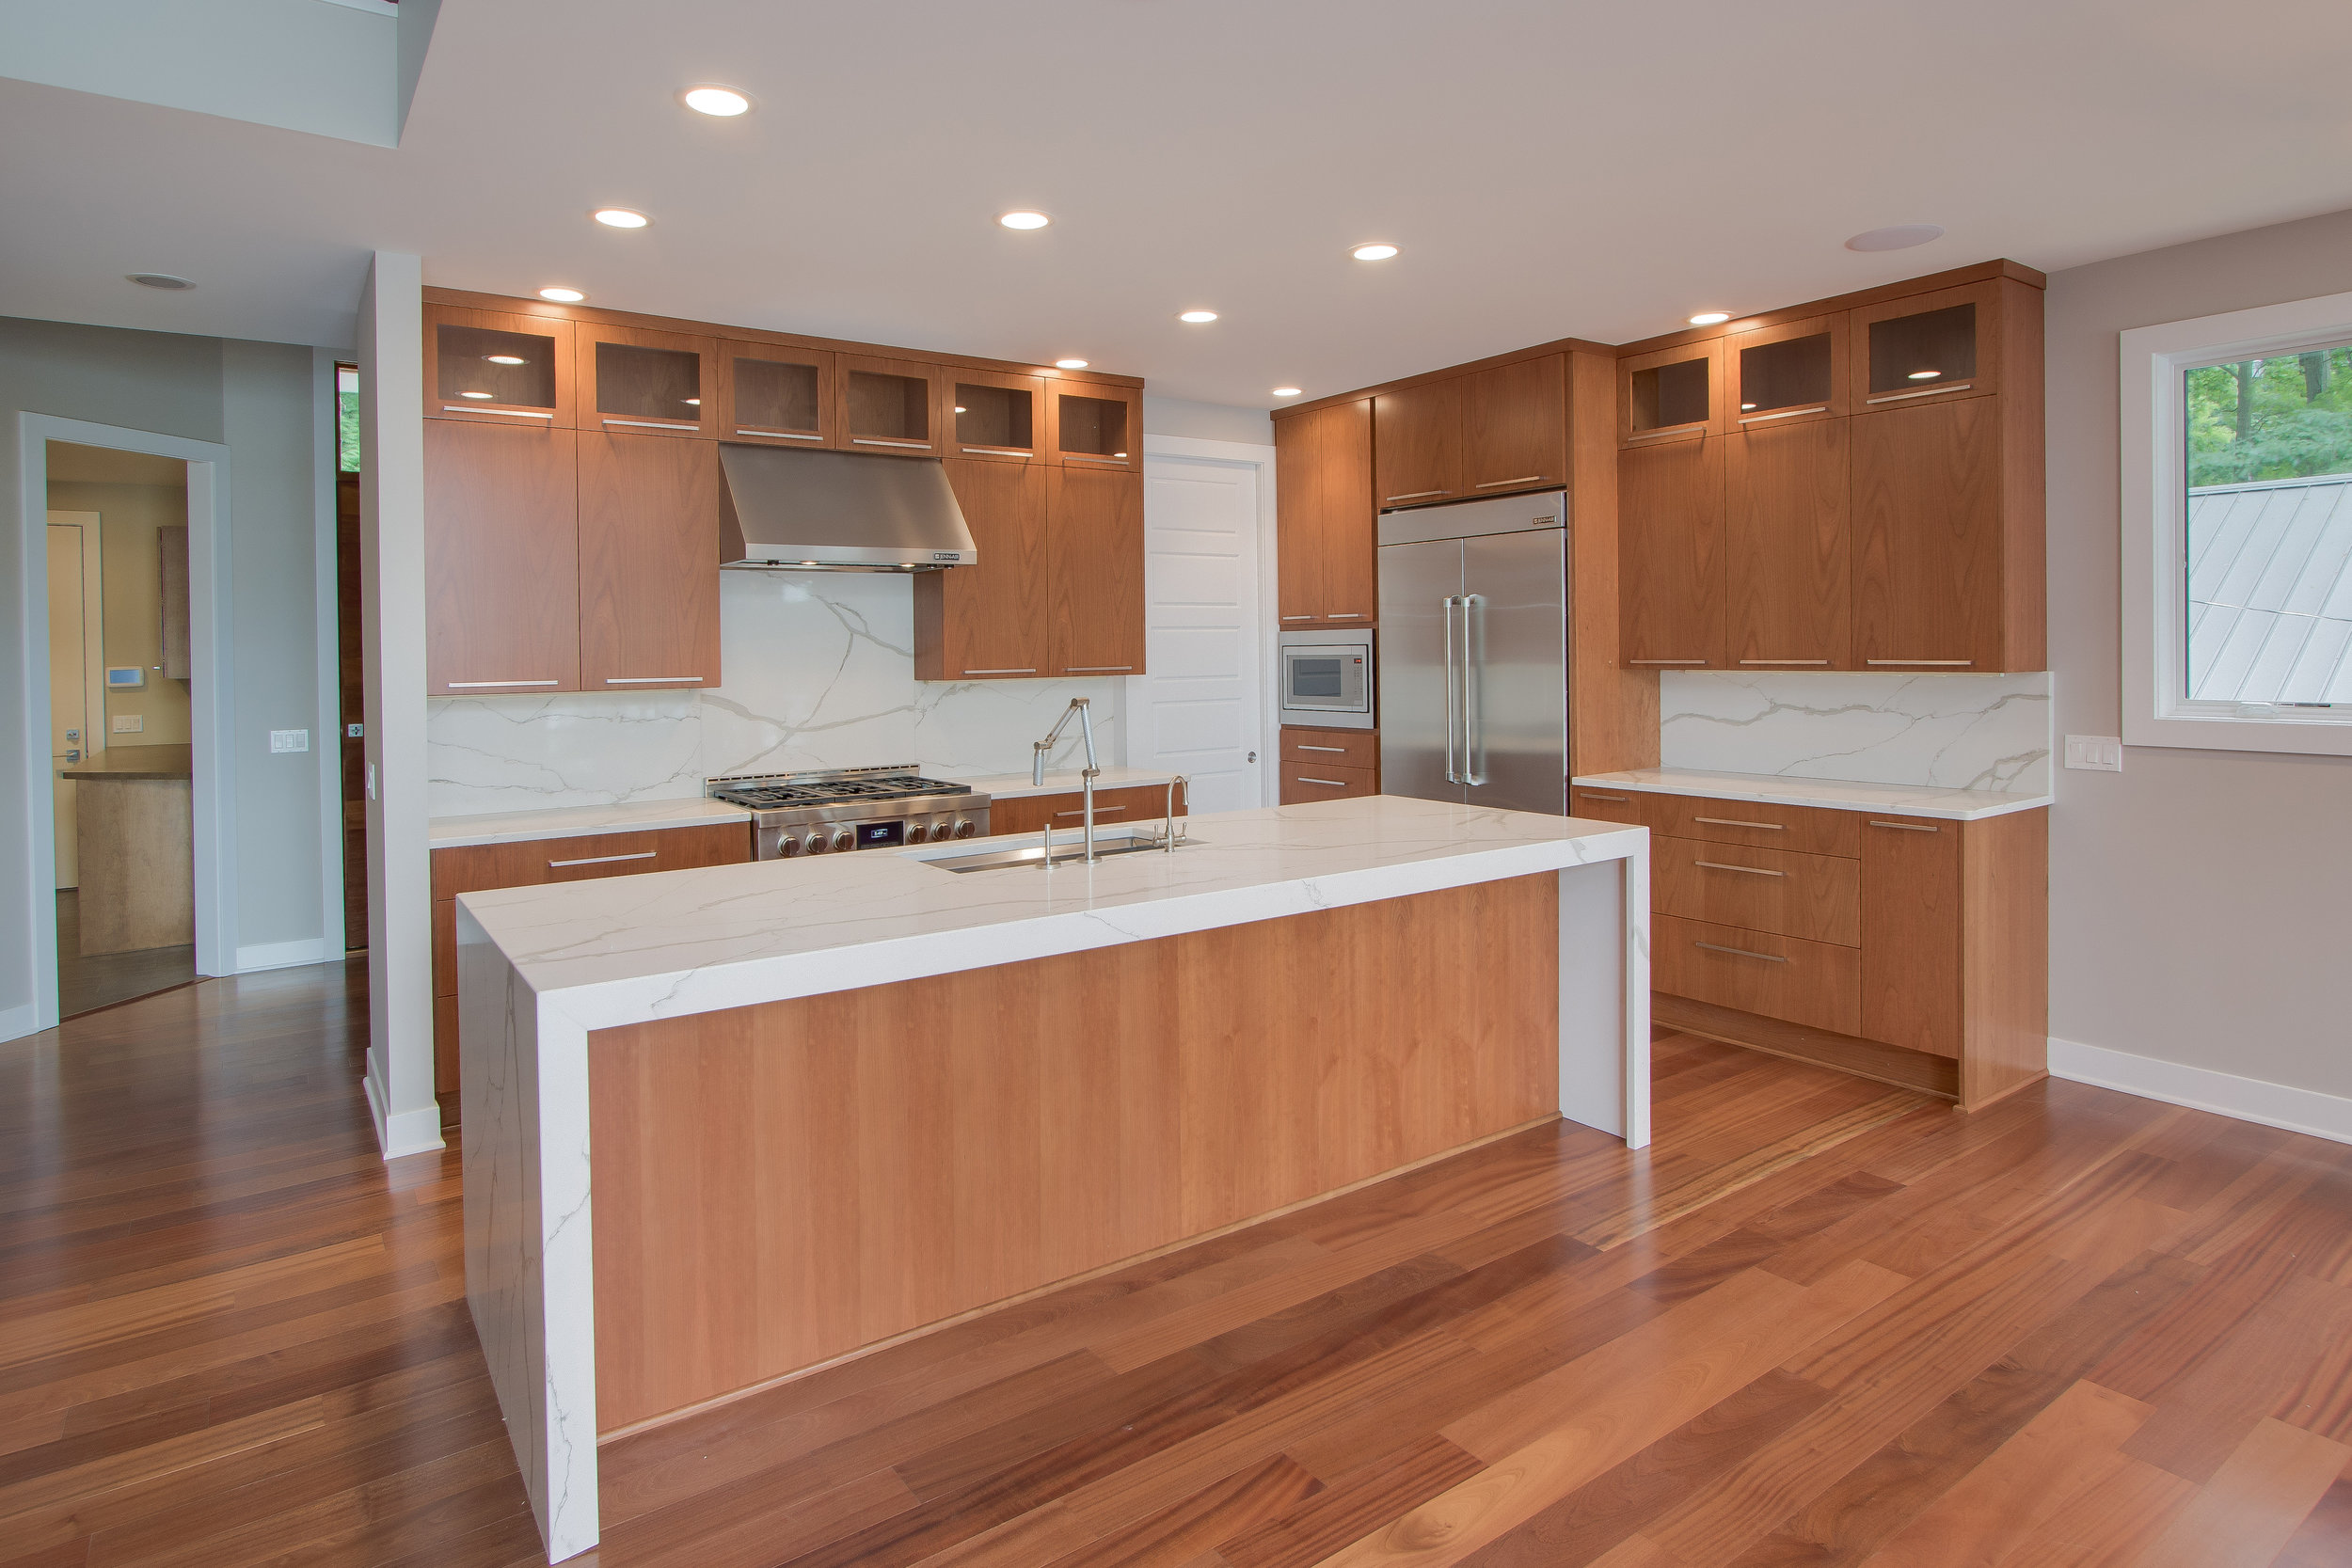 07182016_CUS-15-031_Kitchen_Granite_Hardwood[1].JPG